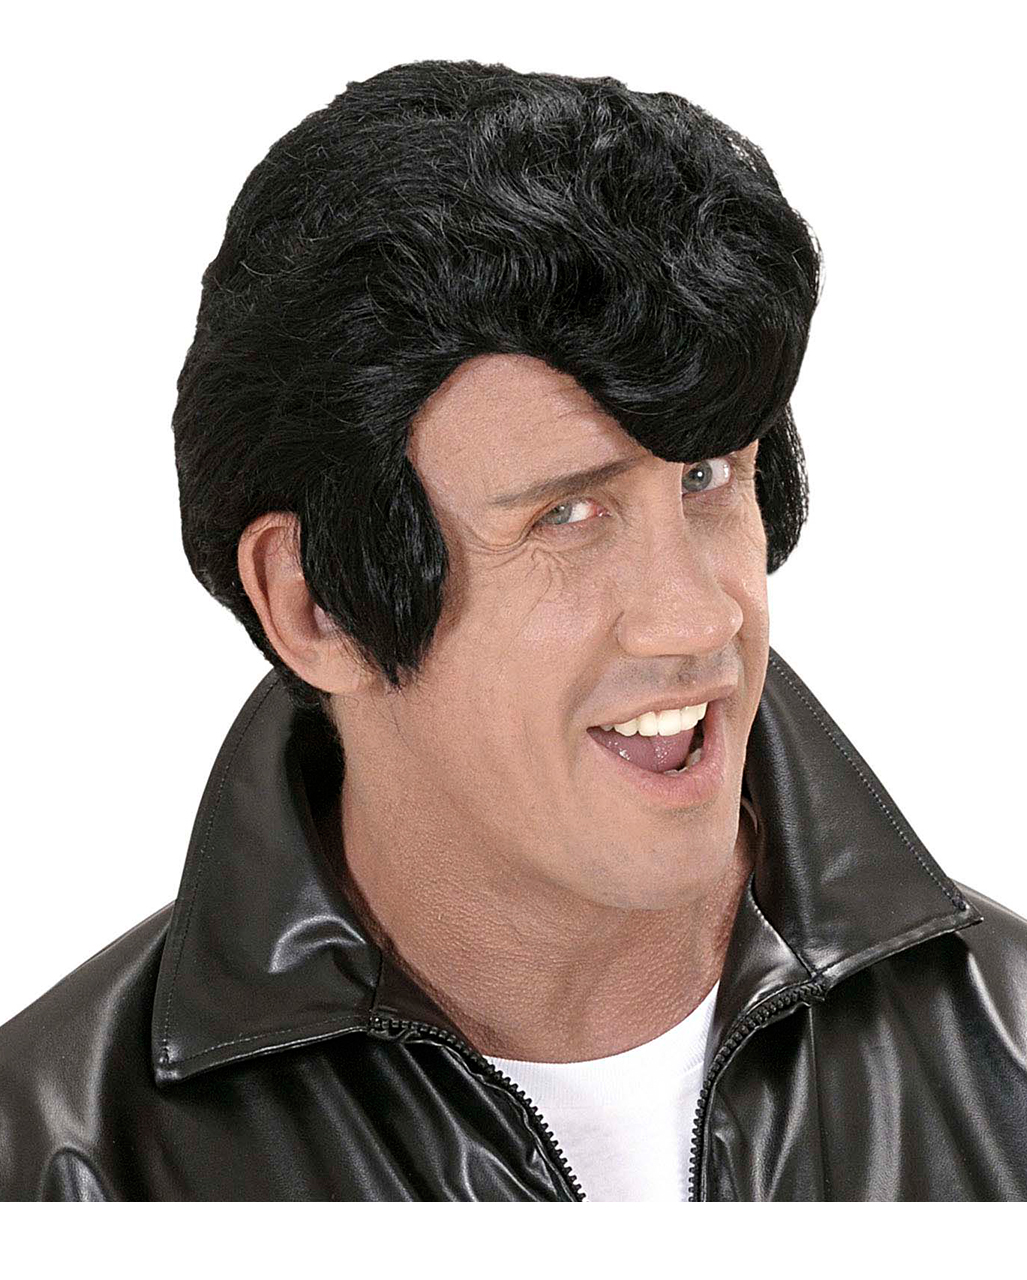 Rockabilly Wig Black Lard Curls Wig Elvis Wig Hair Replacement